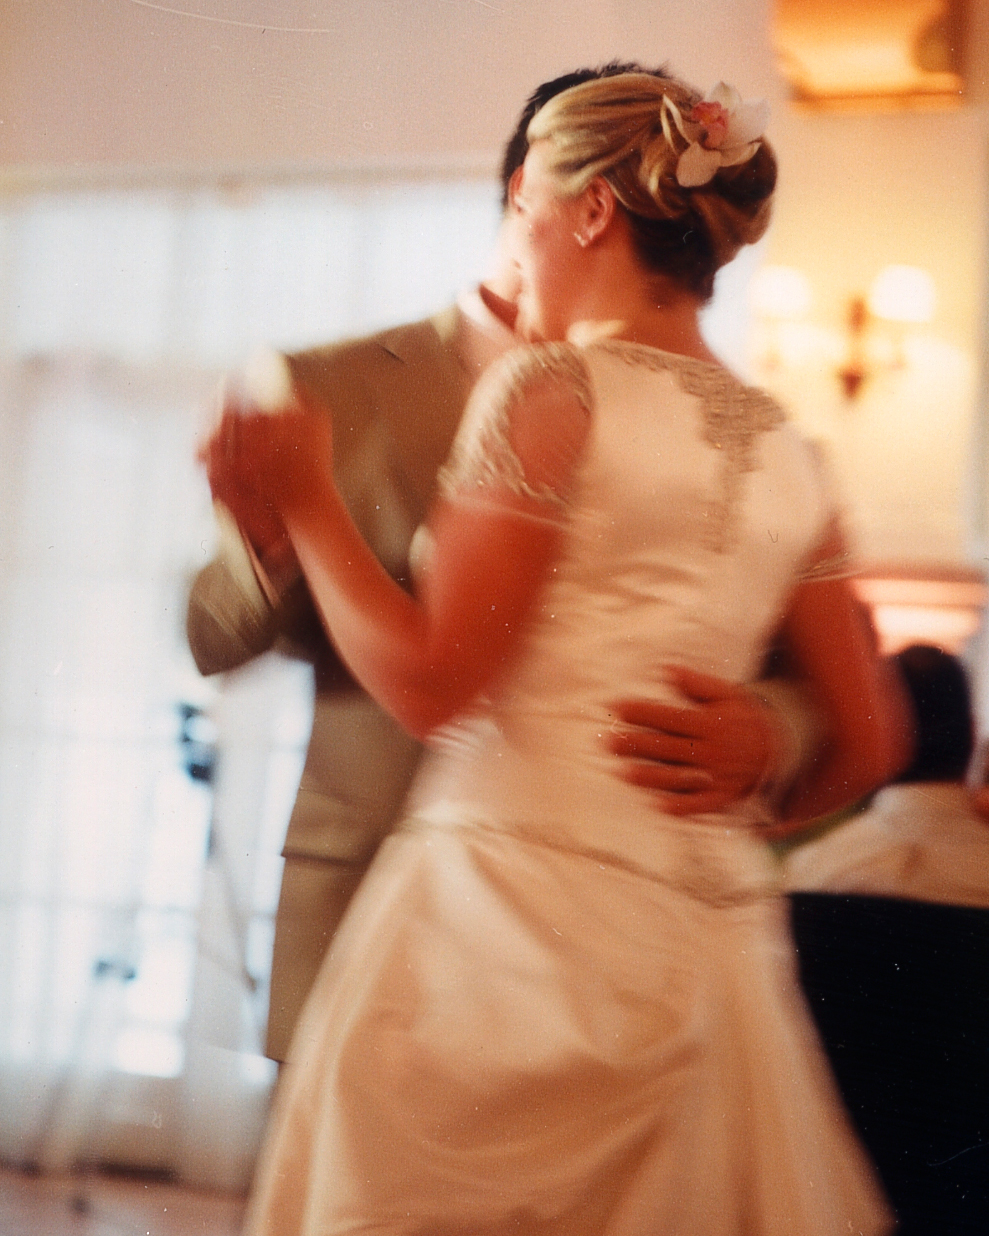 wedding-cover-bands-quique-talavera-0814.jpg